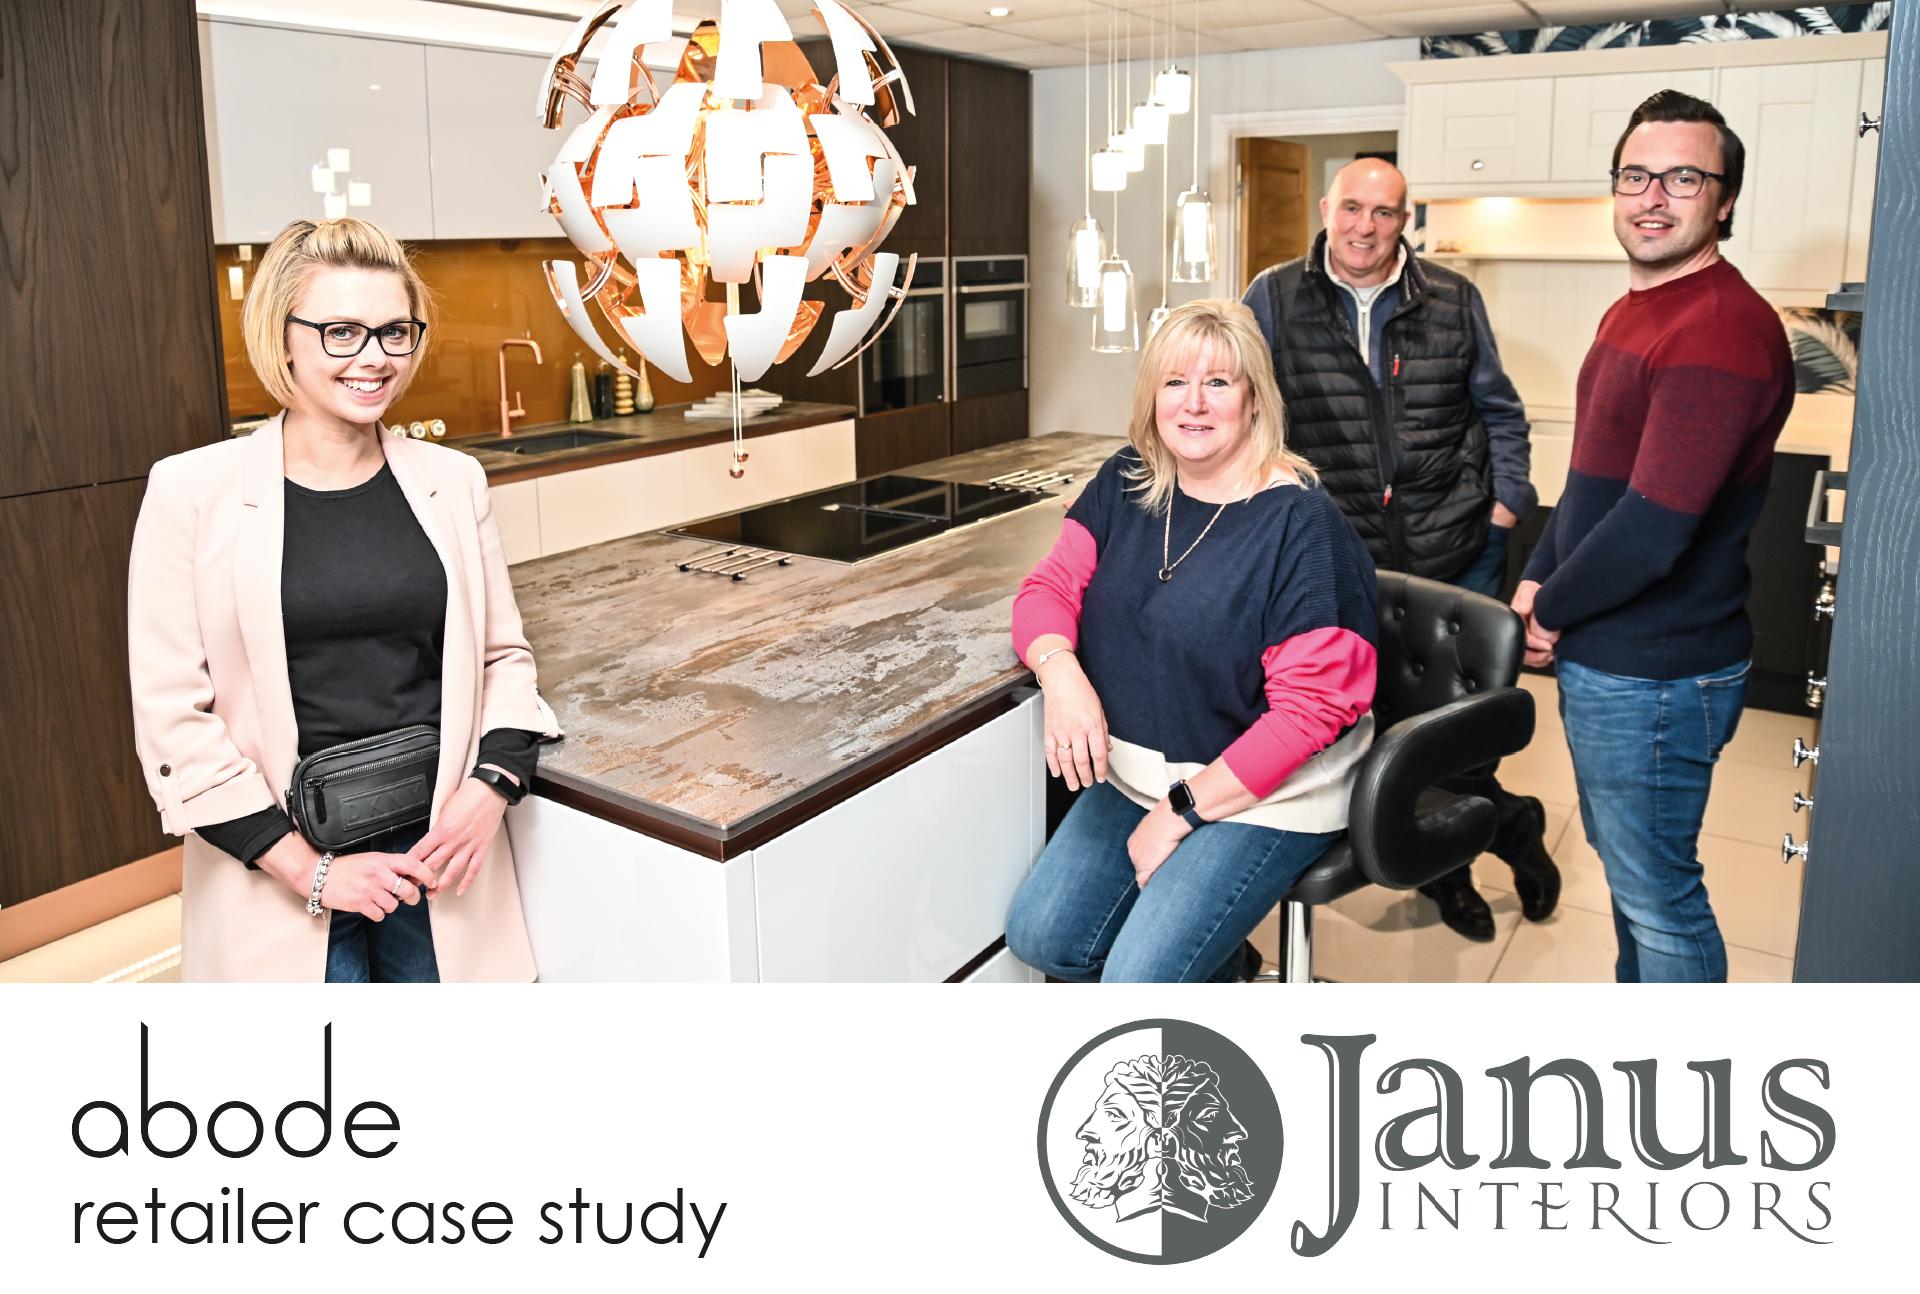 Abode case study